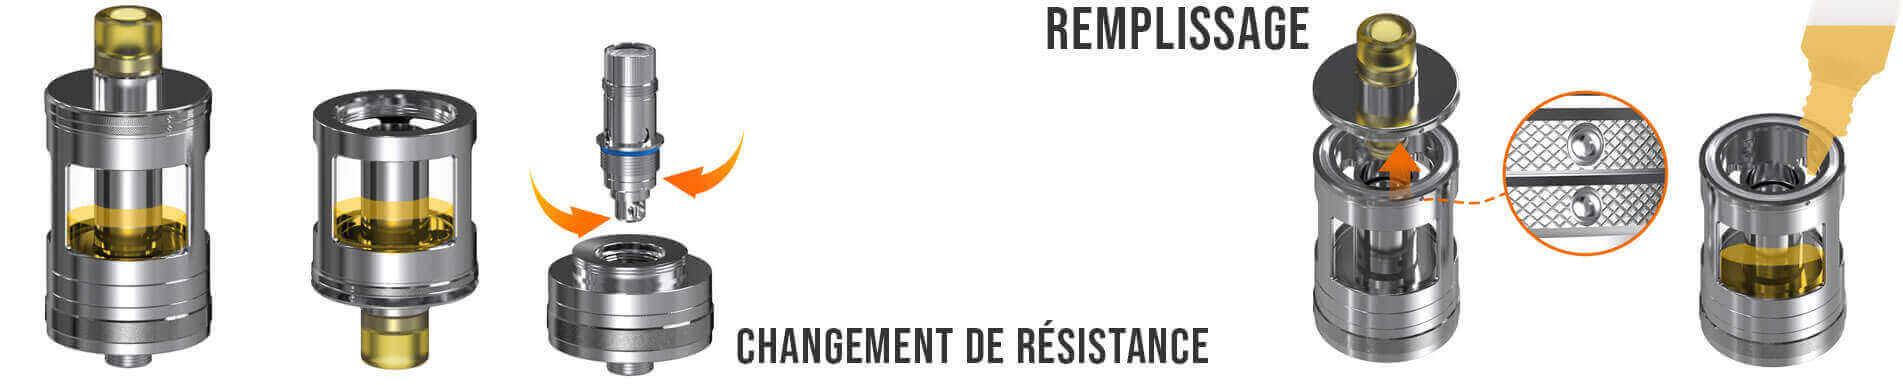 Remplir ou Changer sa résistance Nautilus GT Aspire Taifun